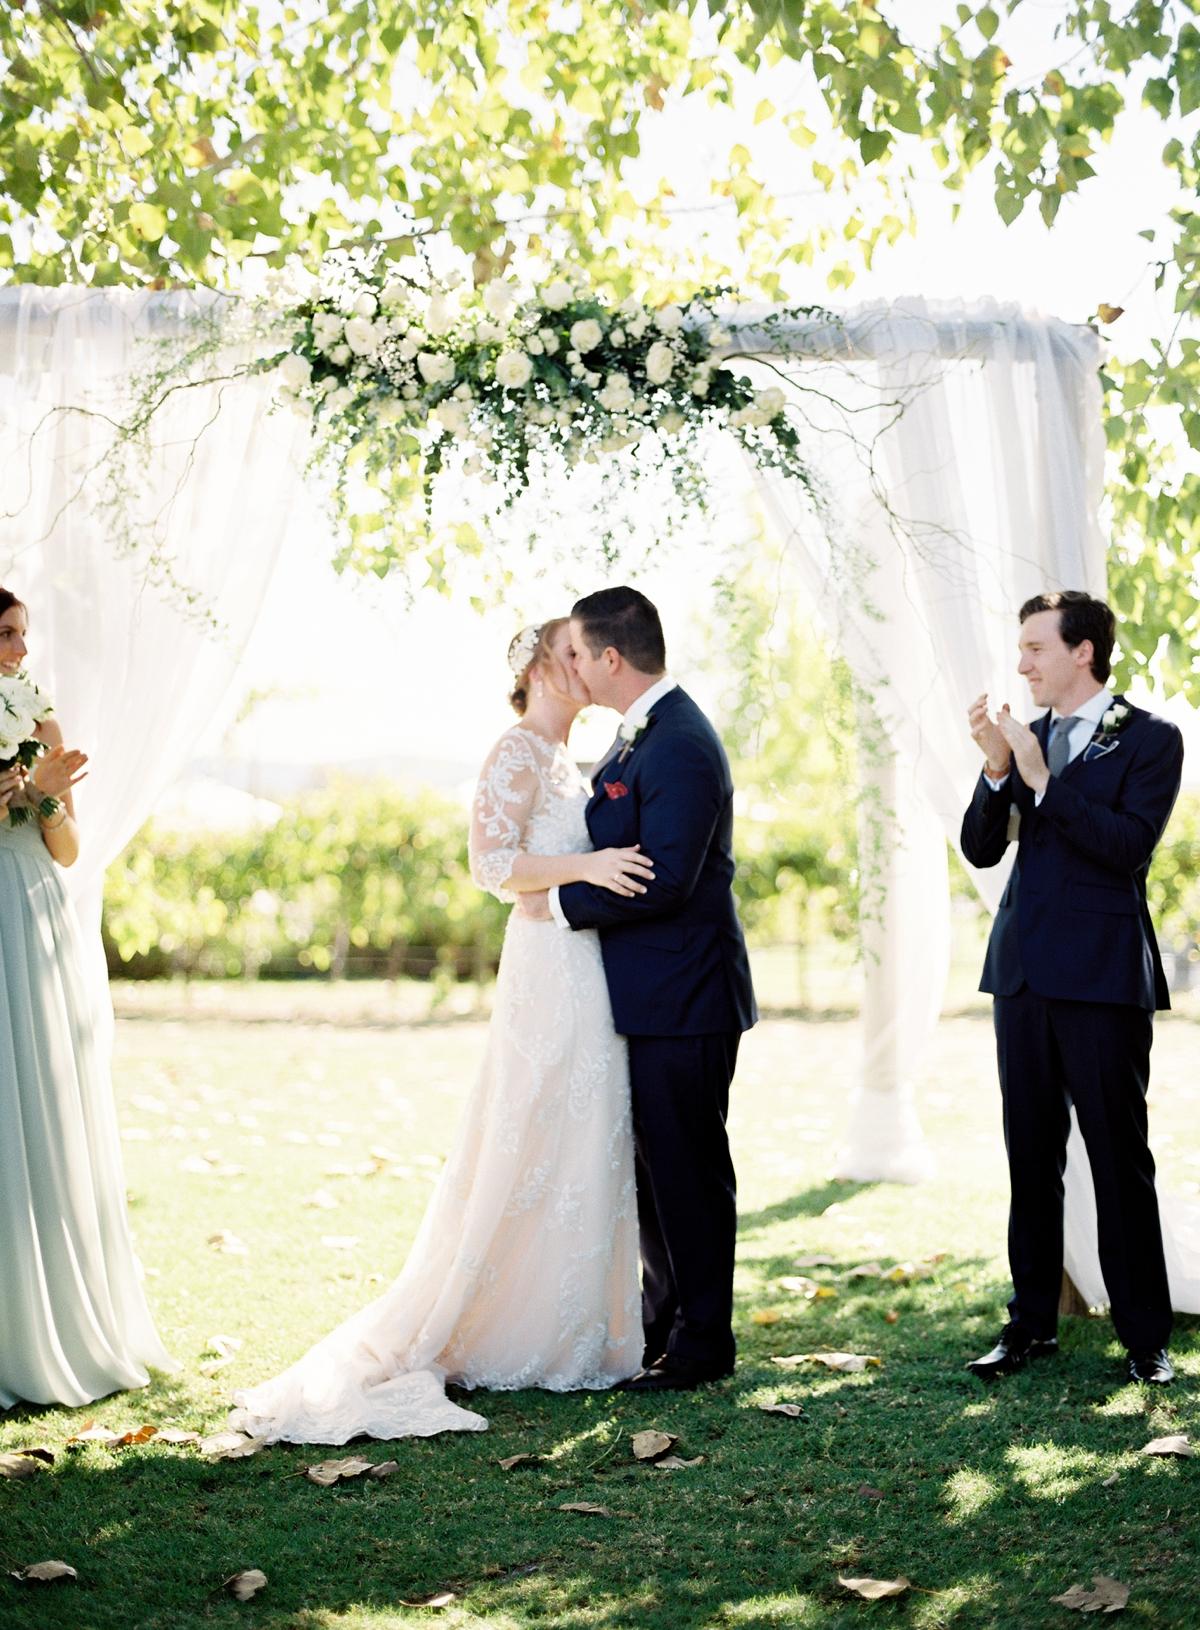 The Vine Grove Mudgee Wedding, Photography by Mr Edwards_1767.jpg